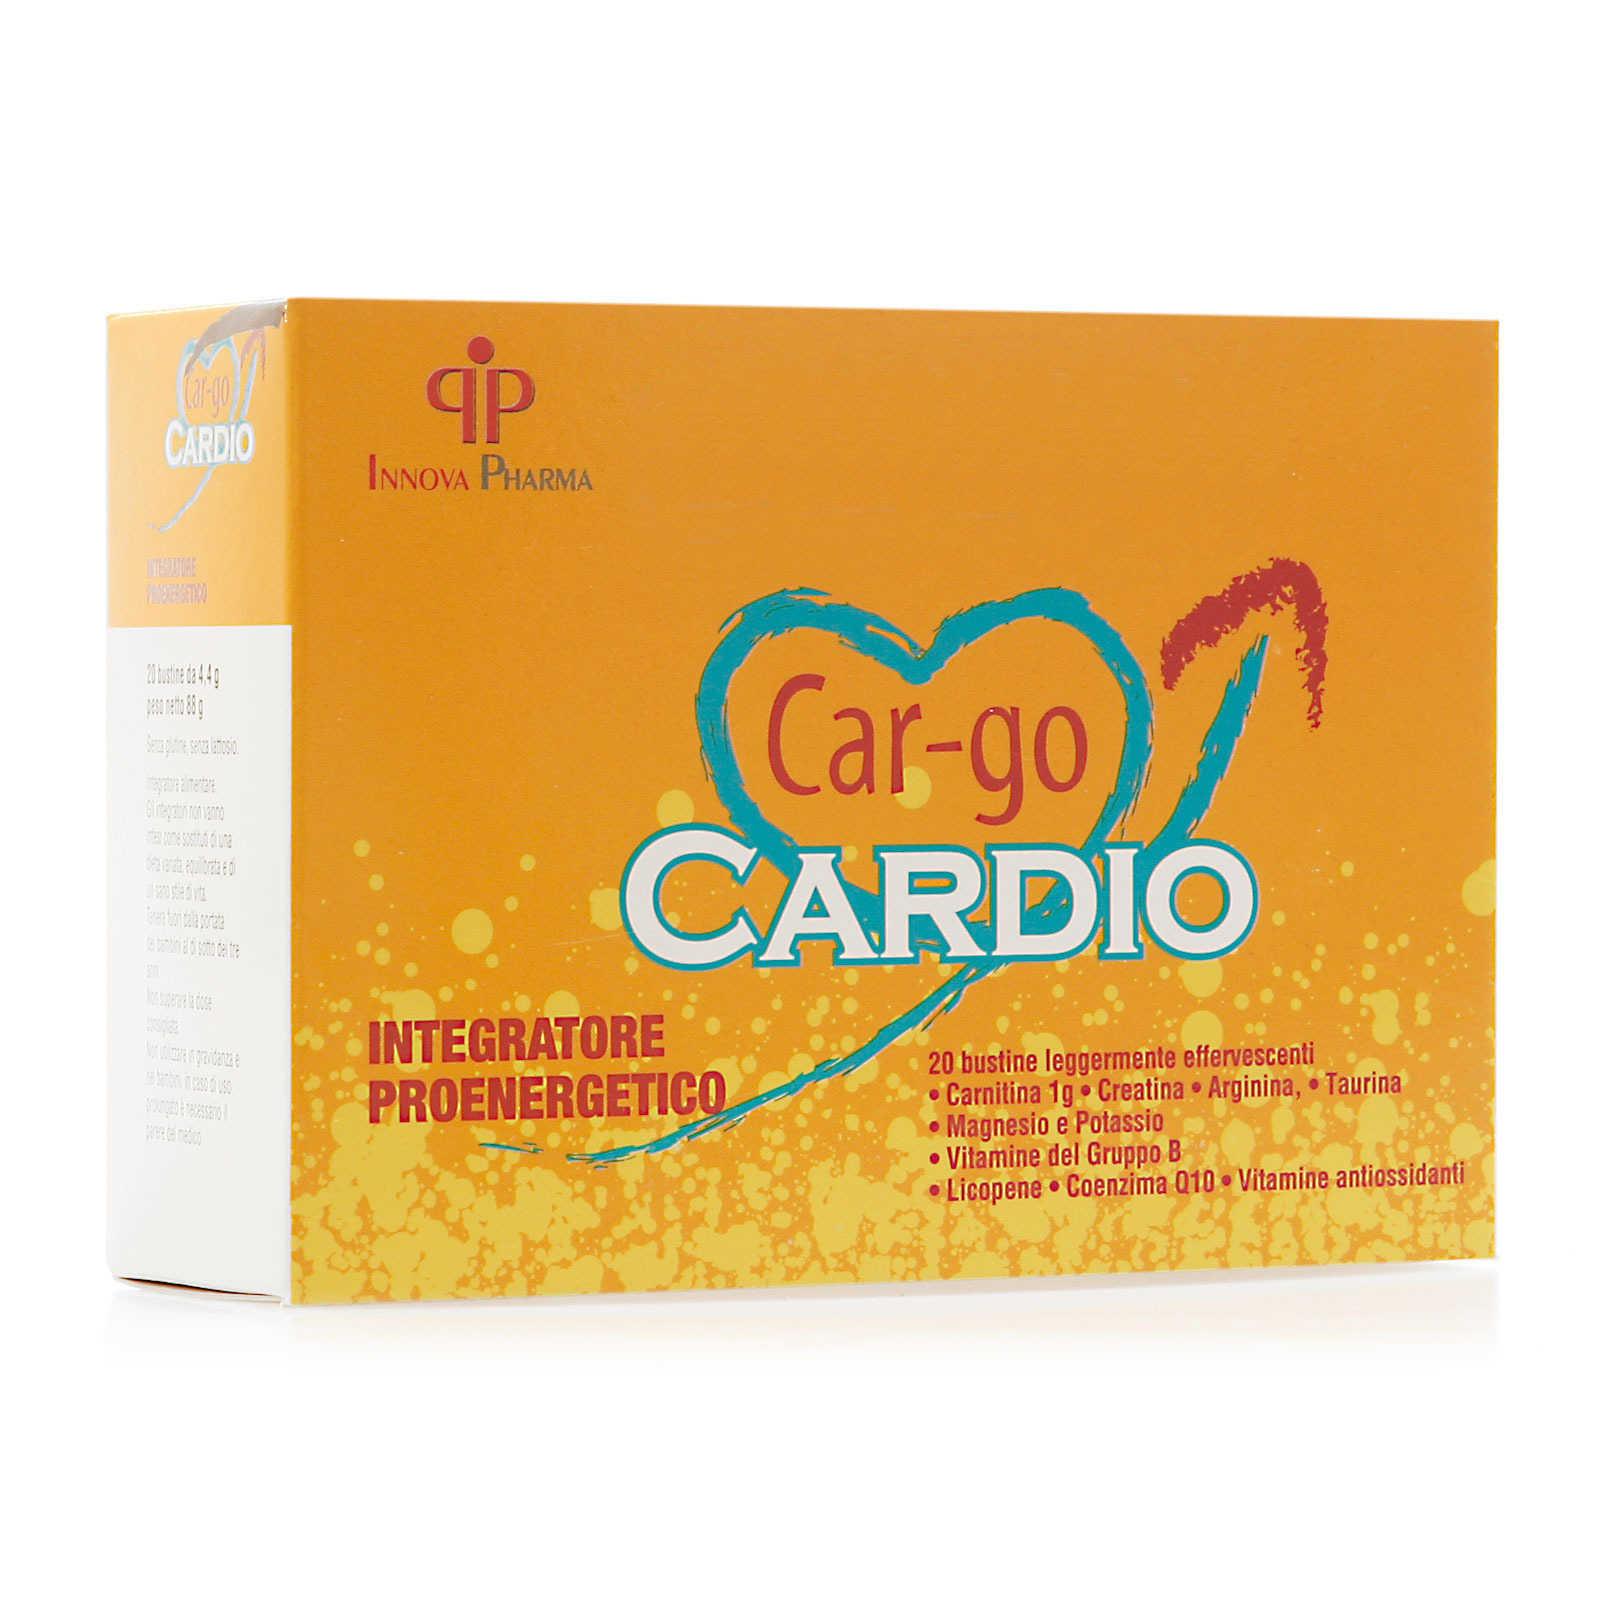 Car-go - Cardio - Integratore Proenergetico